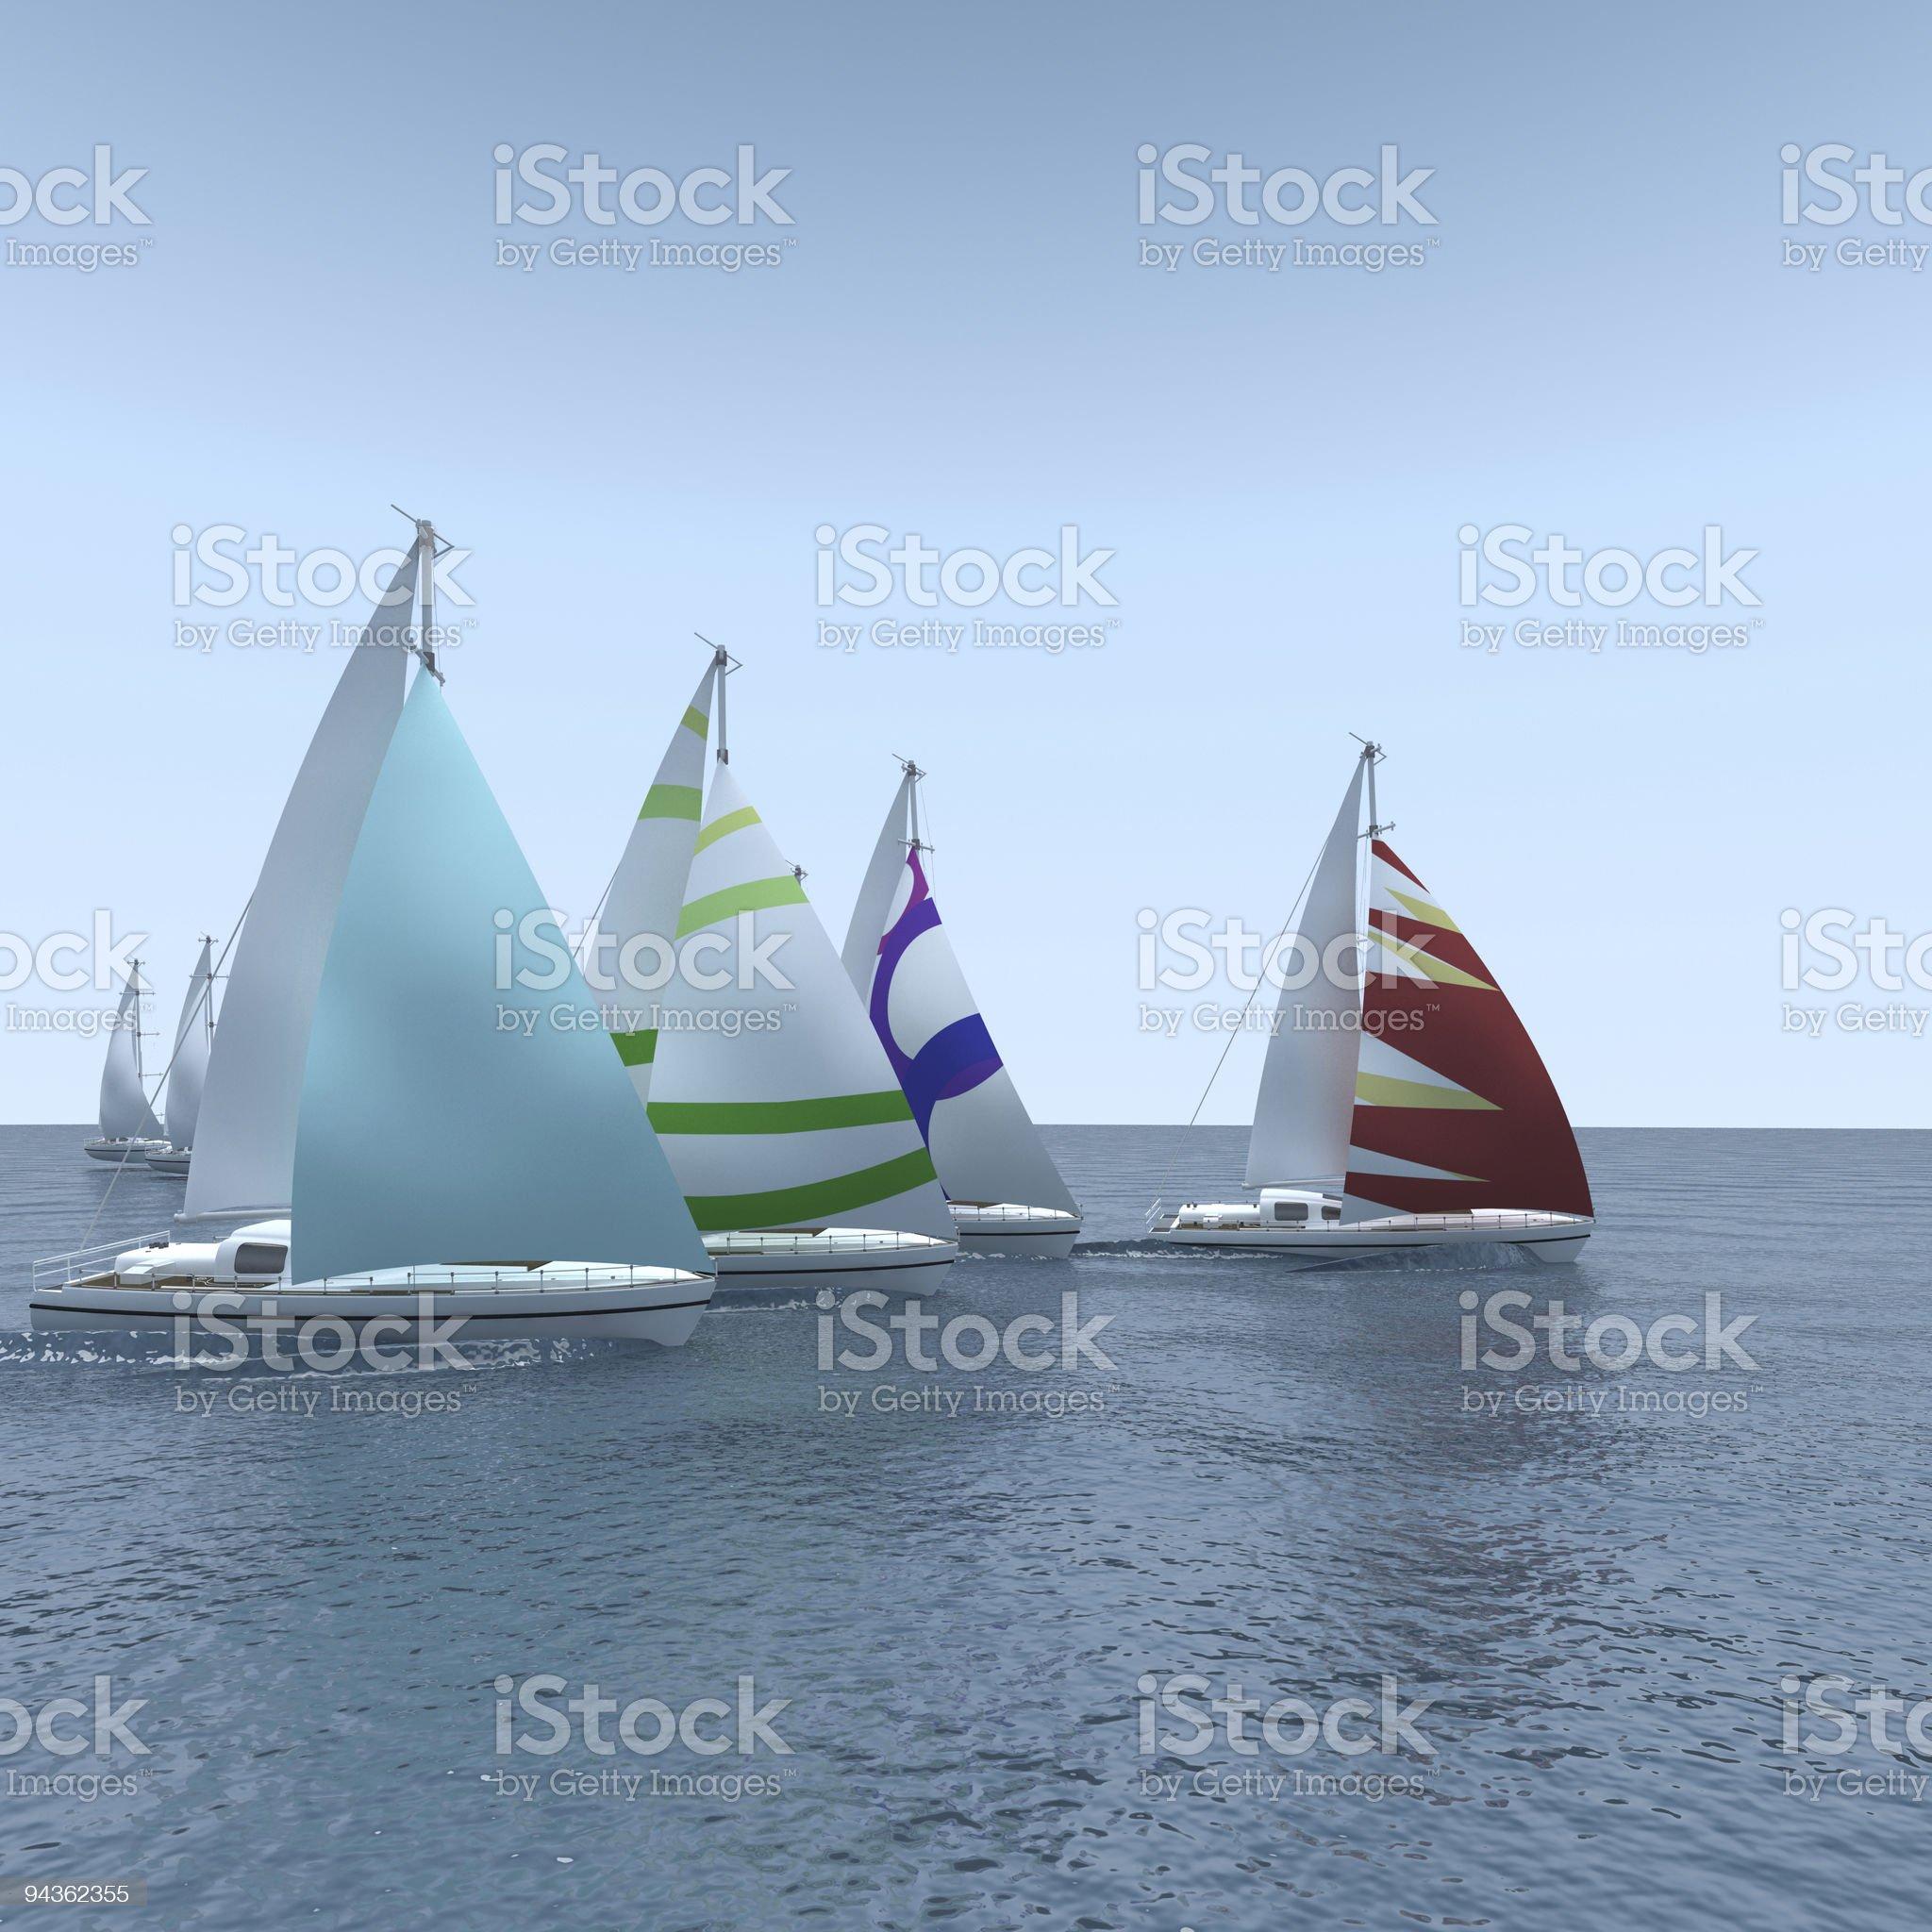 Computer generated sailboat regatta on calm sea royalty-free stock photo